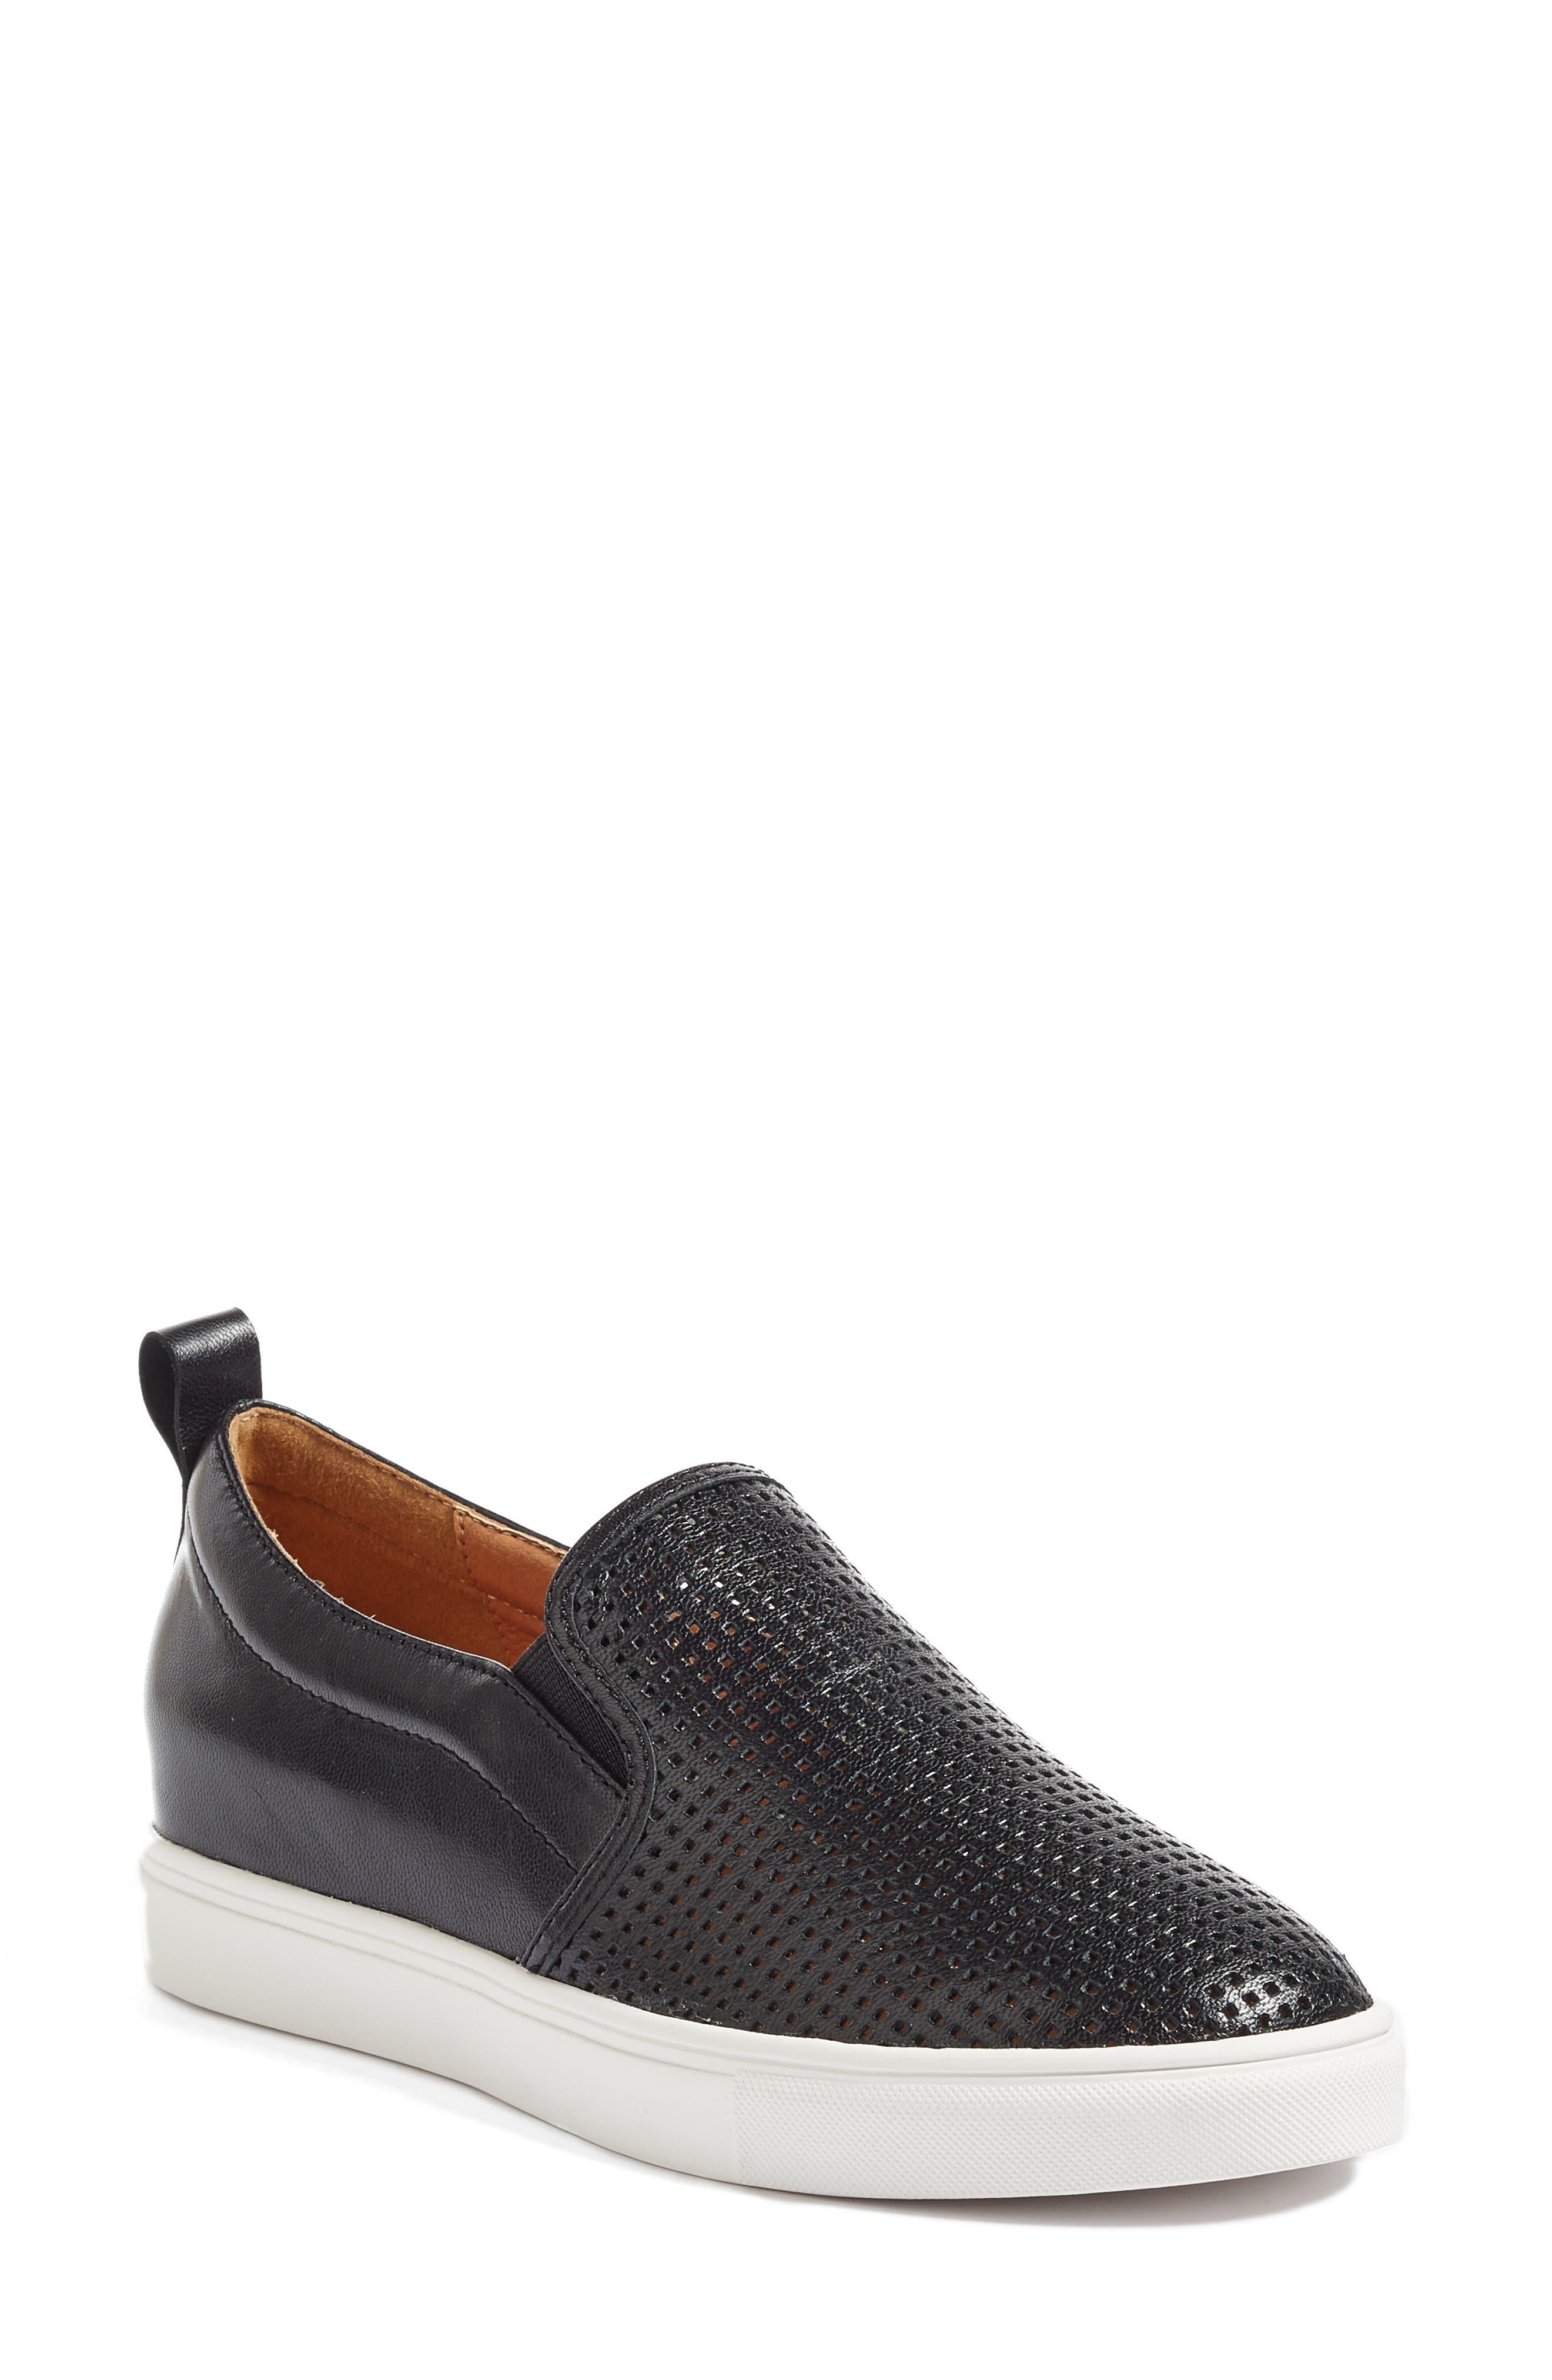 Eden Perforated Slip-On Sneaker,                             Main thumbnail 1, color,                             001